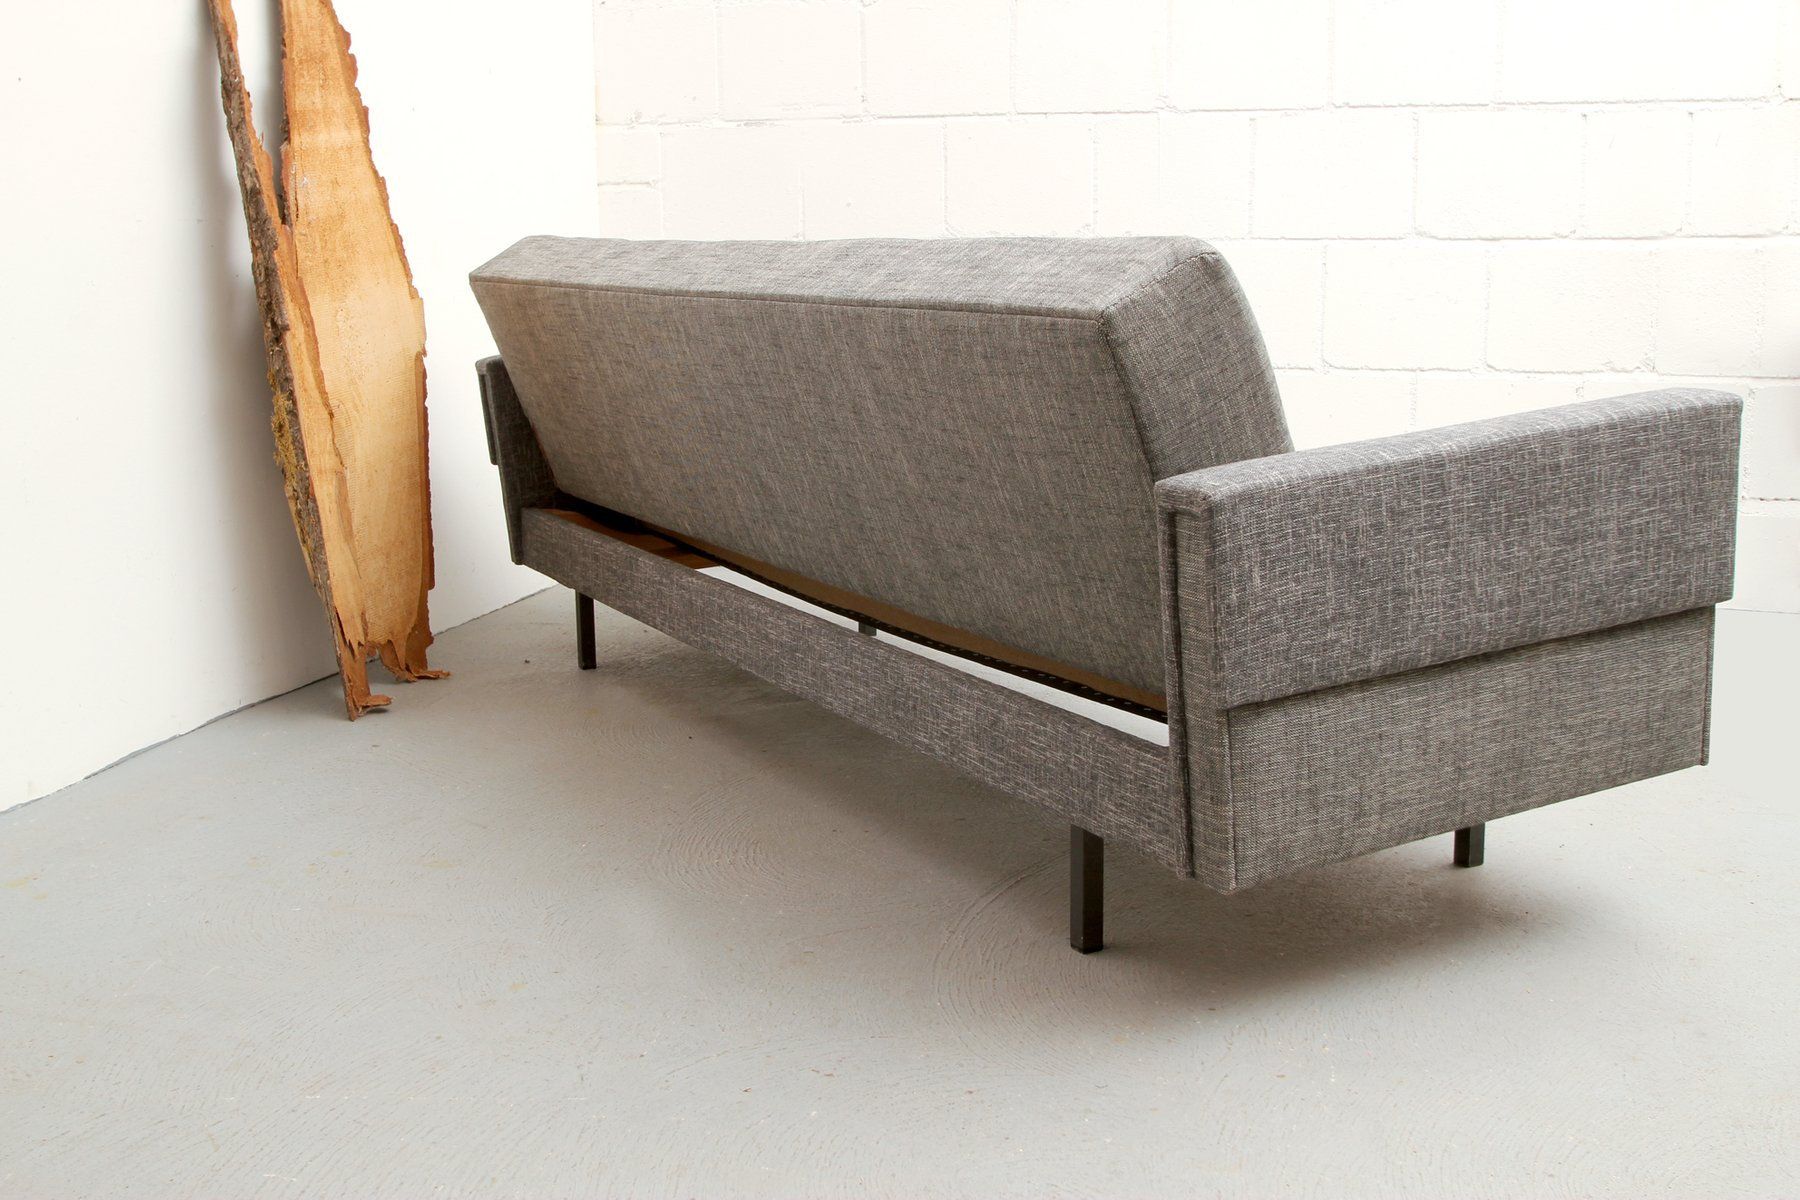 Mid Century Click Clack Sofa, 1960s for sale at Pamono